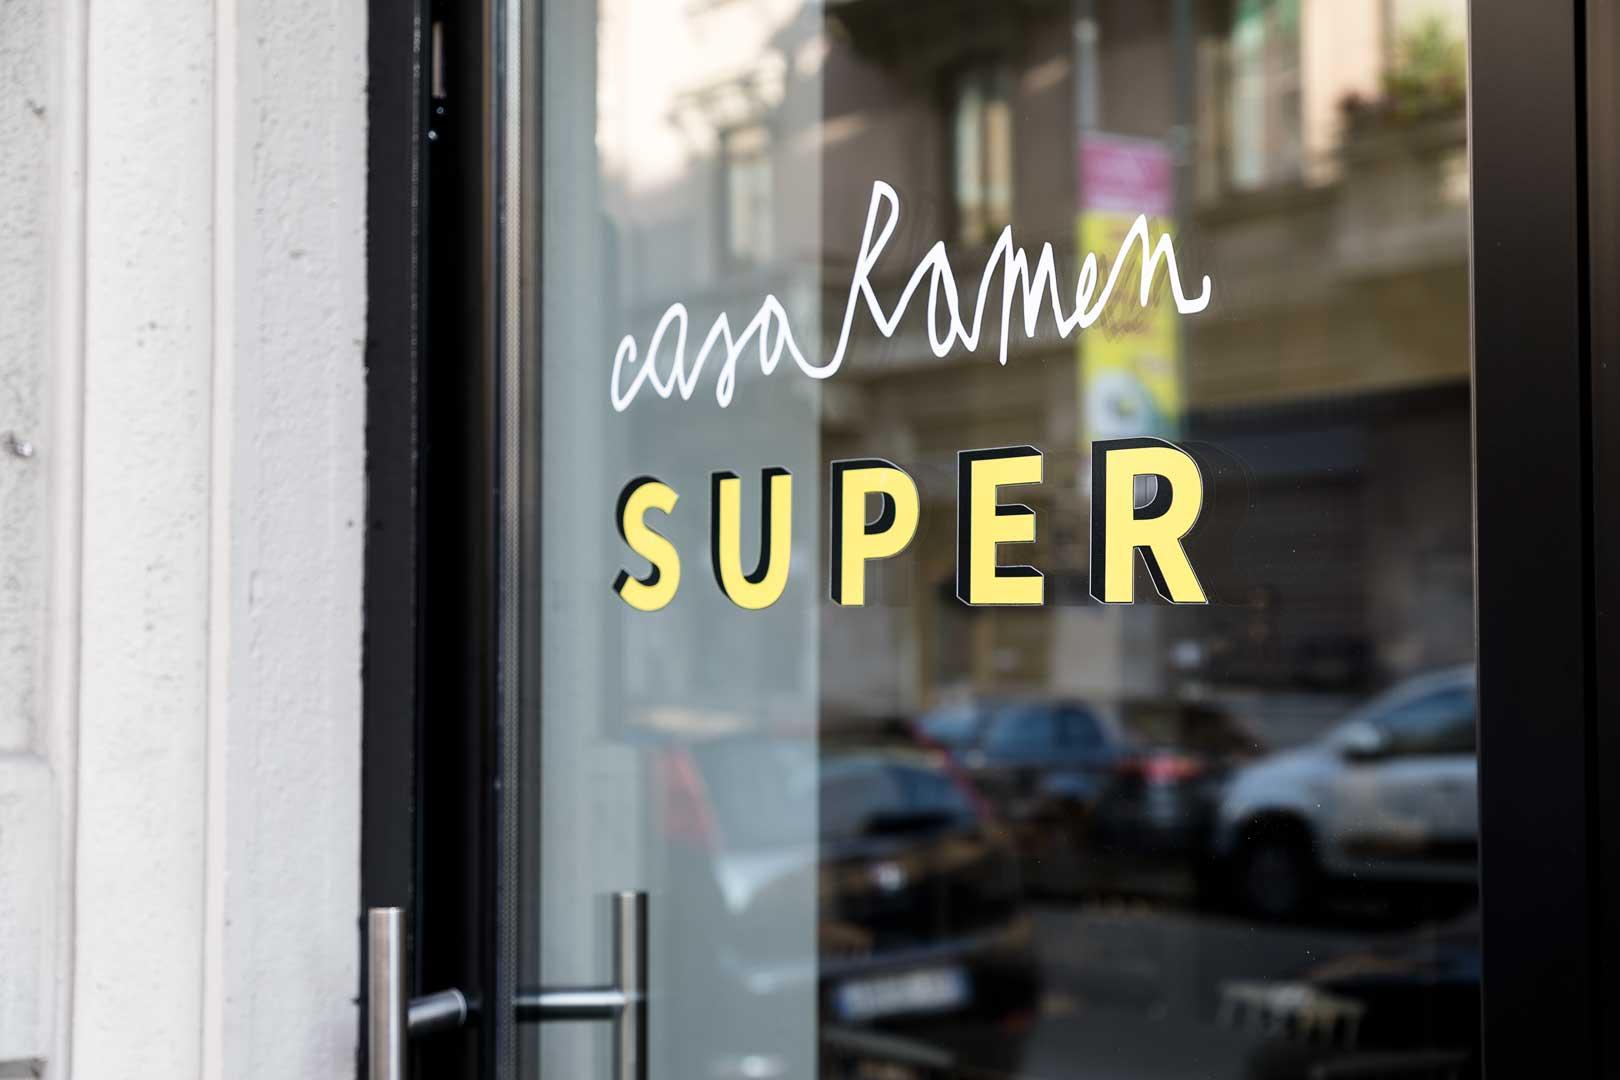 Dezainaa_casa-ramen-super-logo.jpg